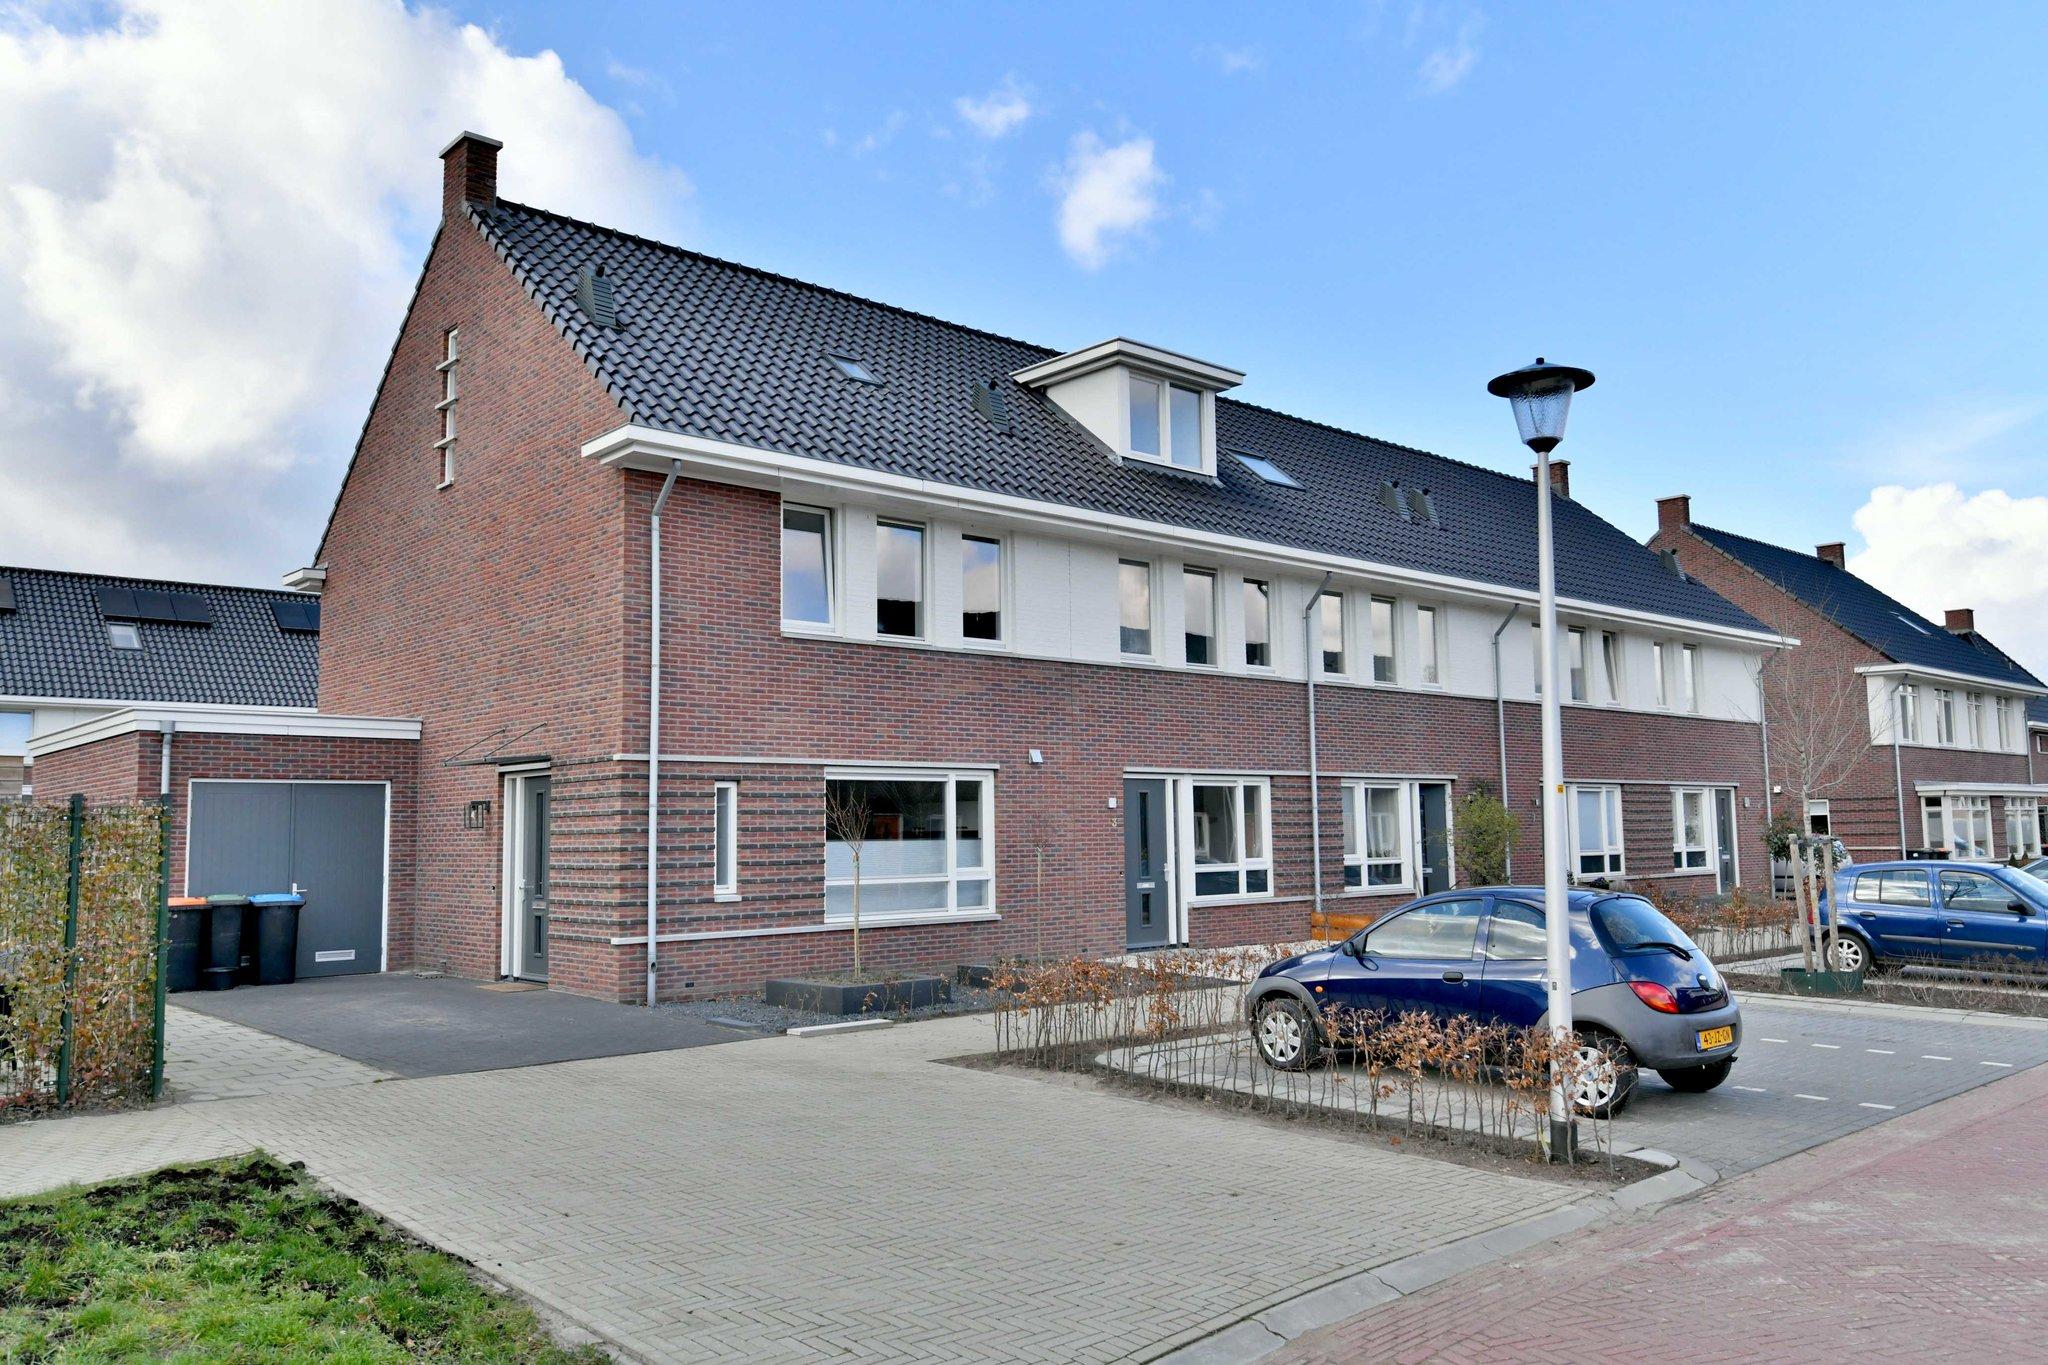 epse-marienhorst-4412137-foto-2.jpg